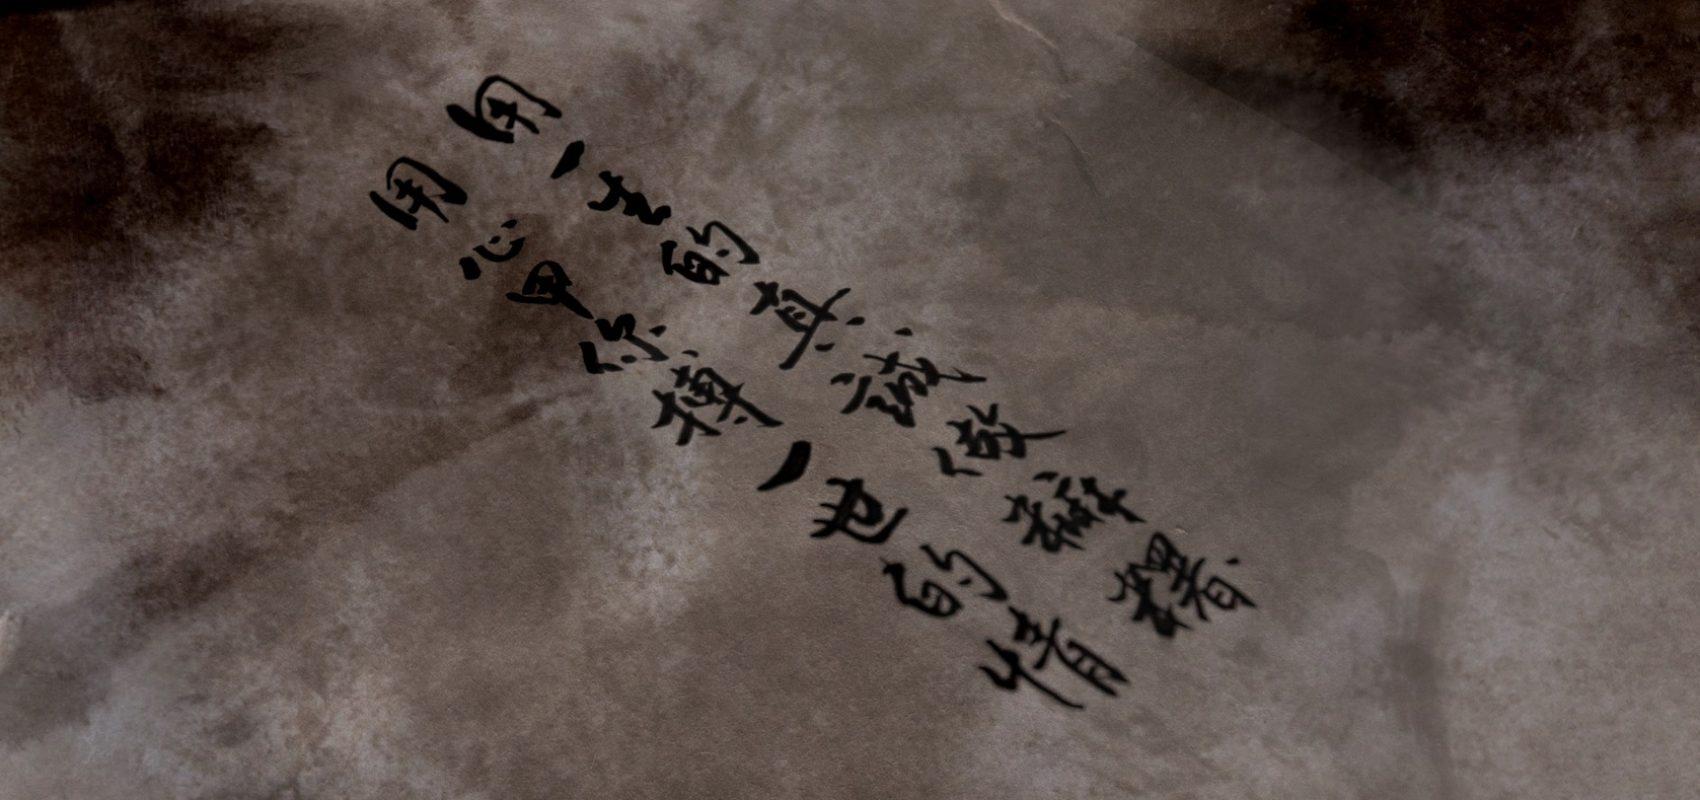 tzen,花蓮特產,曾記麻糬,hualien